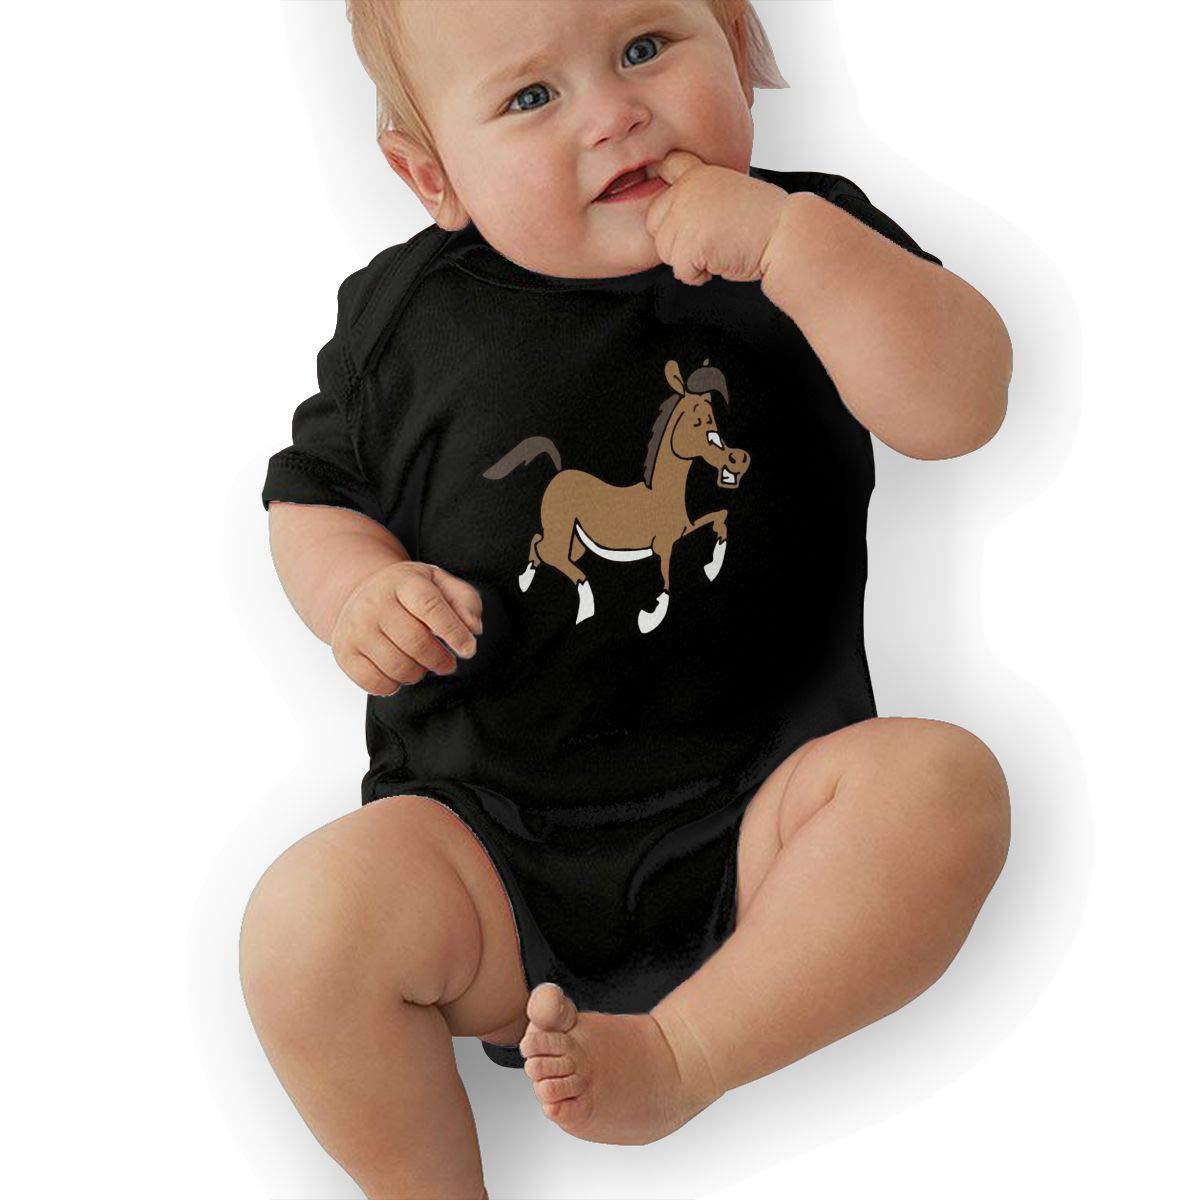 BONLOR Cute Funny Jumping Horse Baby Boys Girls Jumpsuits Short Sleeve Romper Bodysuit Bodysuit Jumpsuit Outfits Black